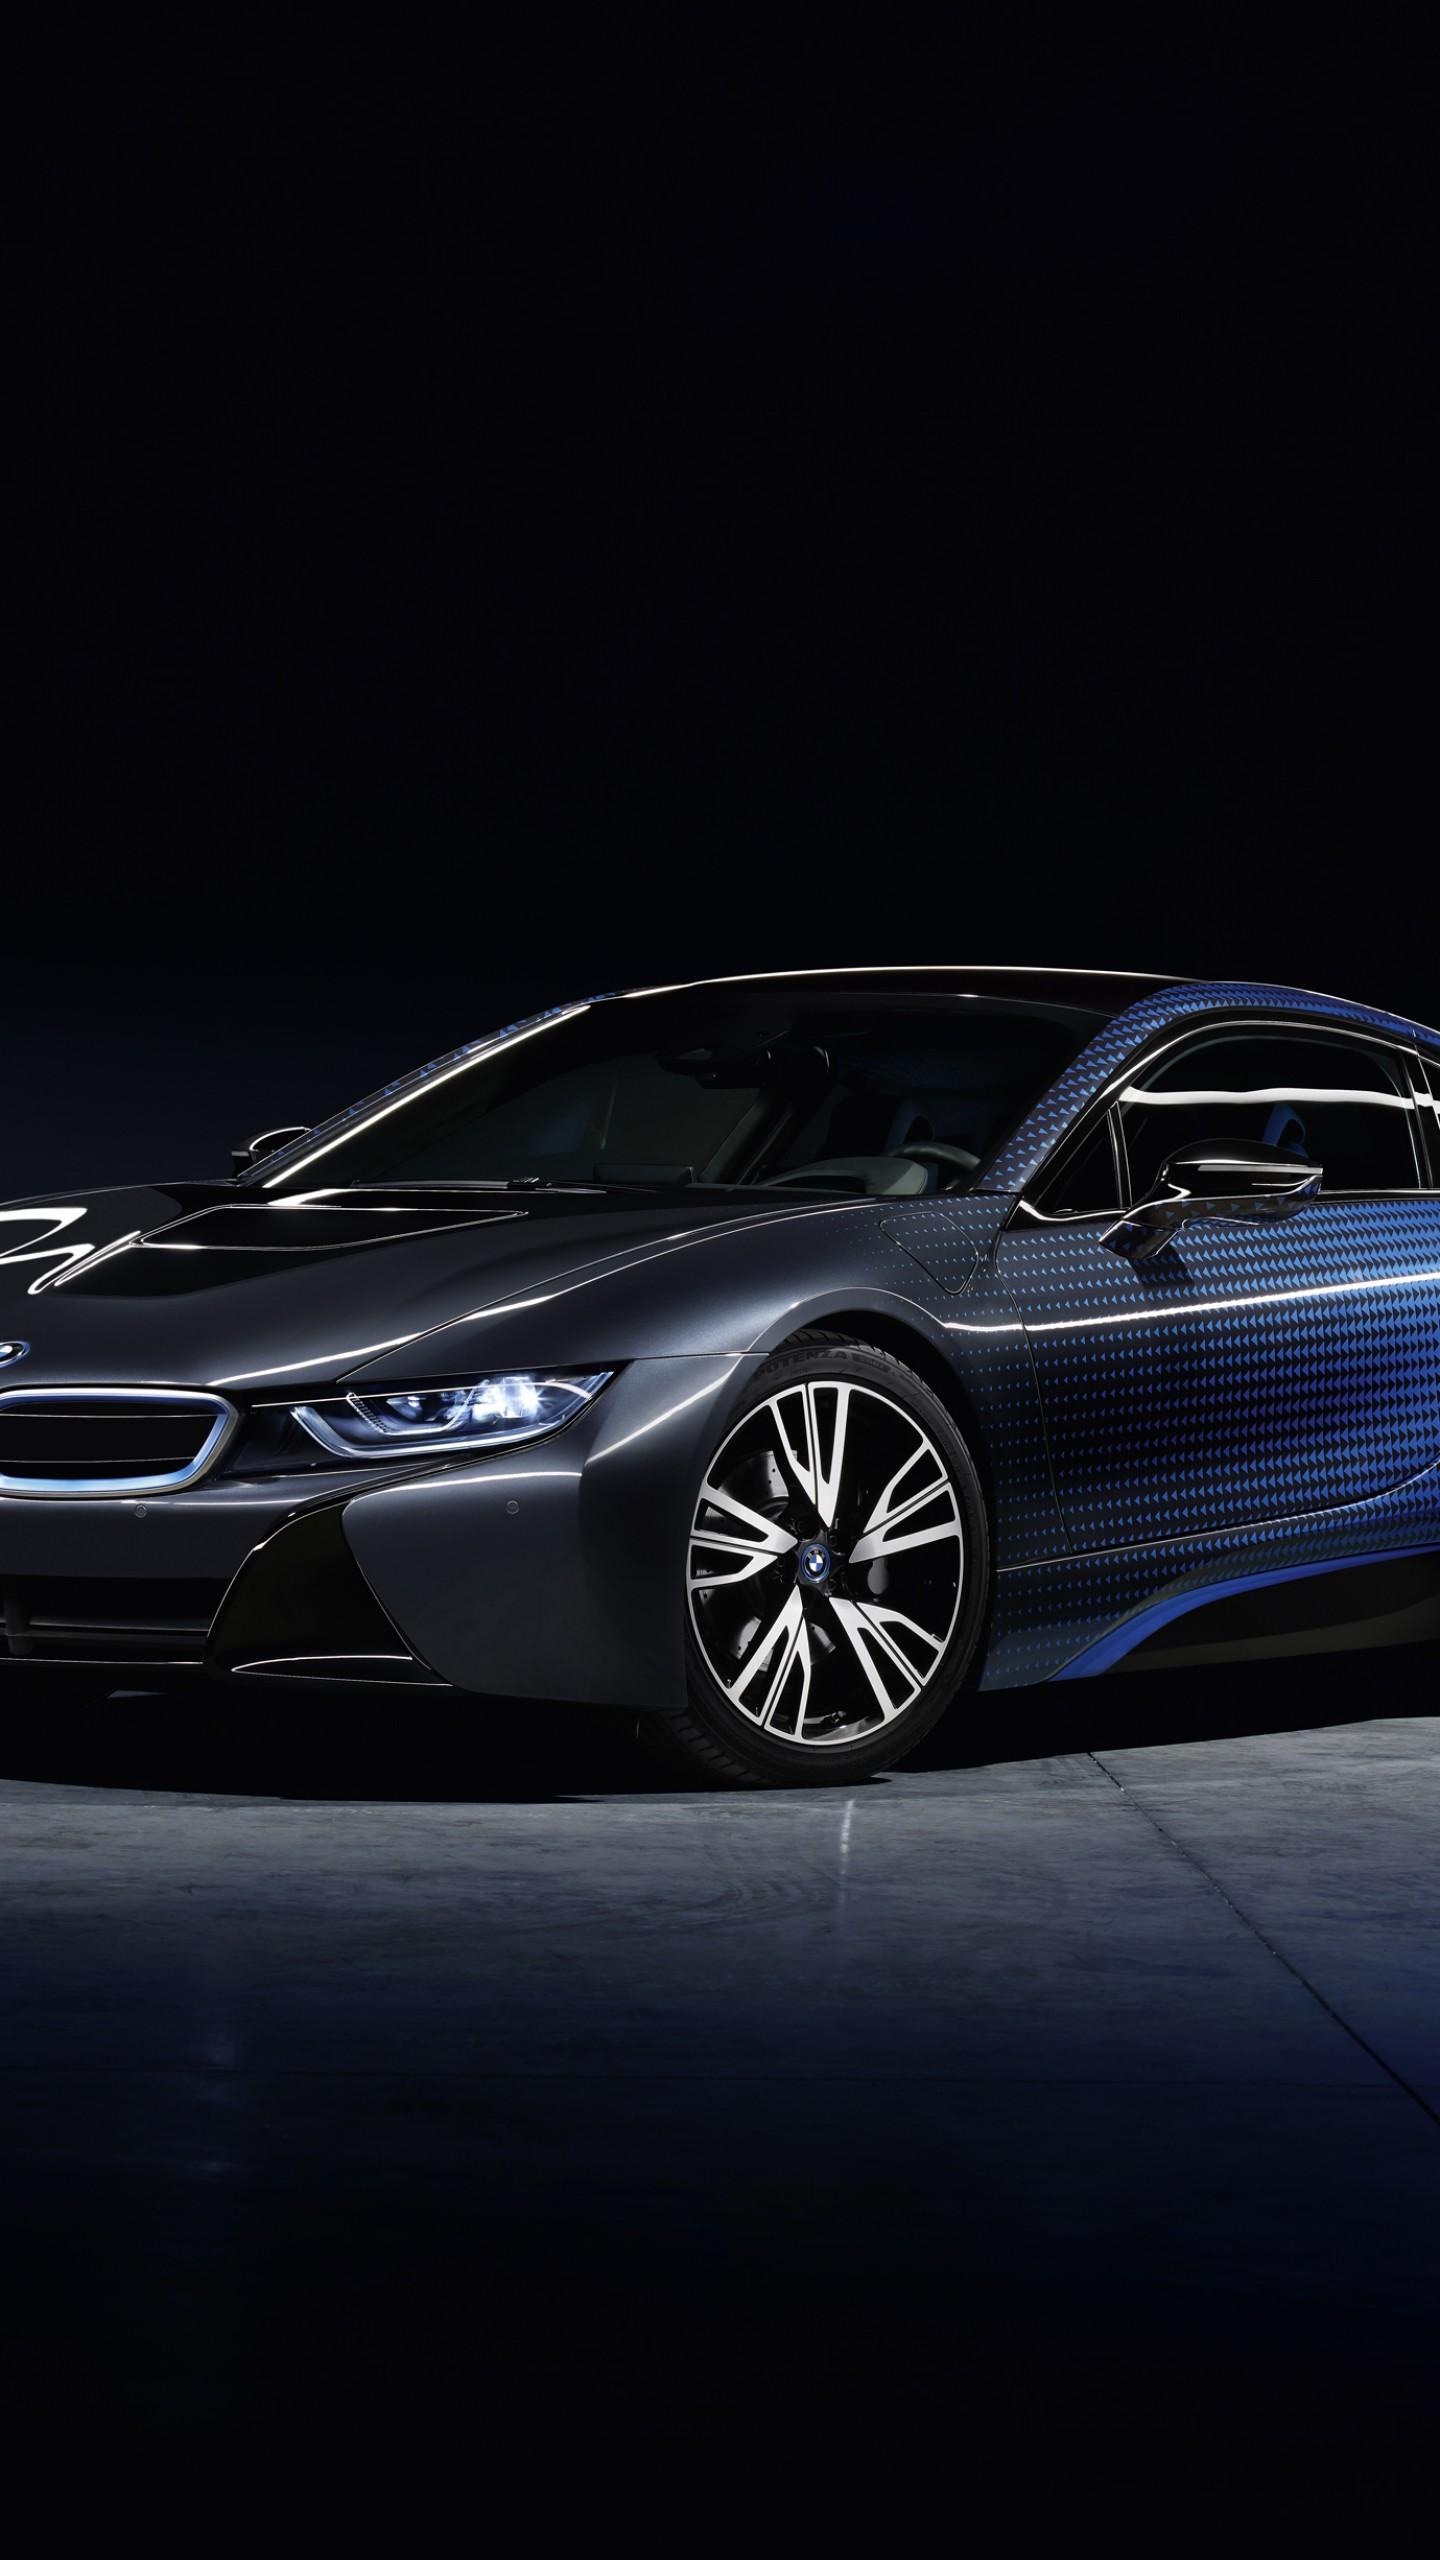 Wallpaper bmw i8 garage italia electric cars paris auto for Garage automobile paris 12